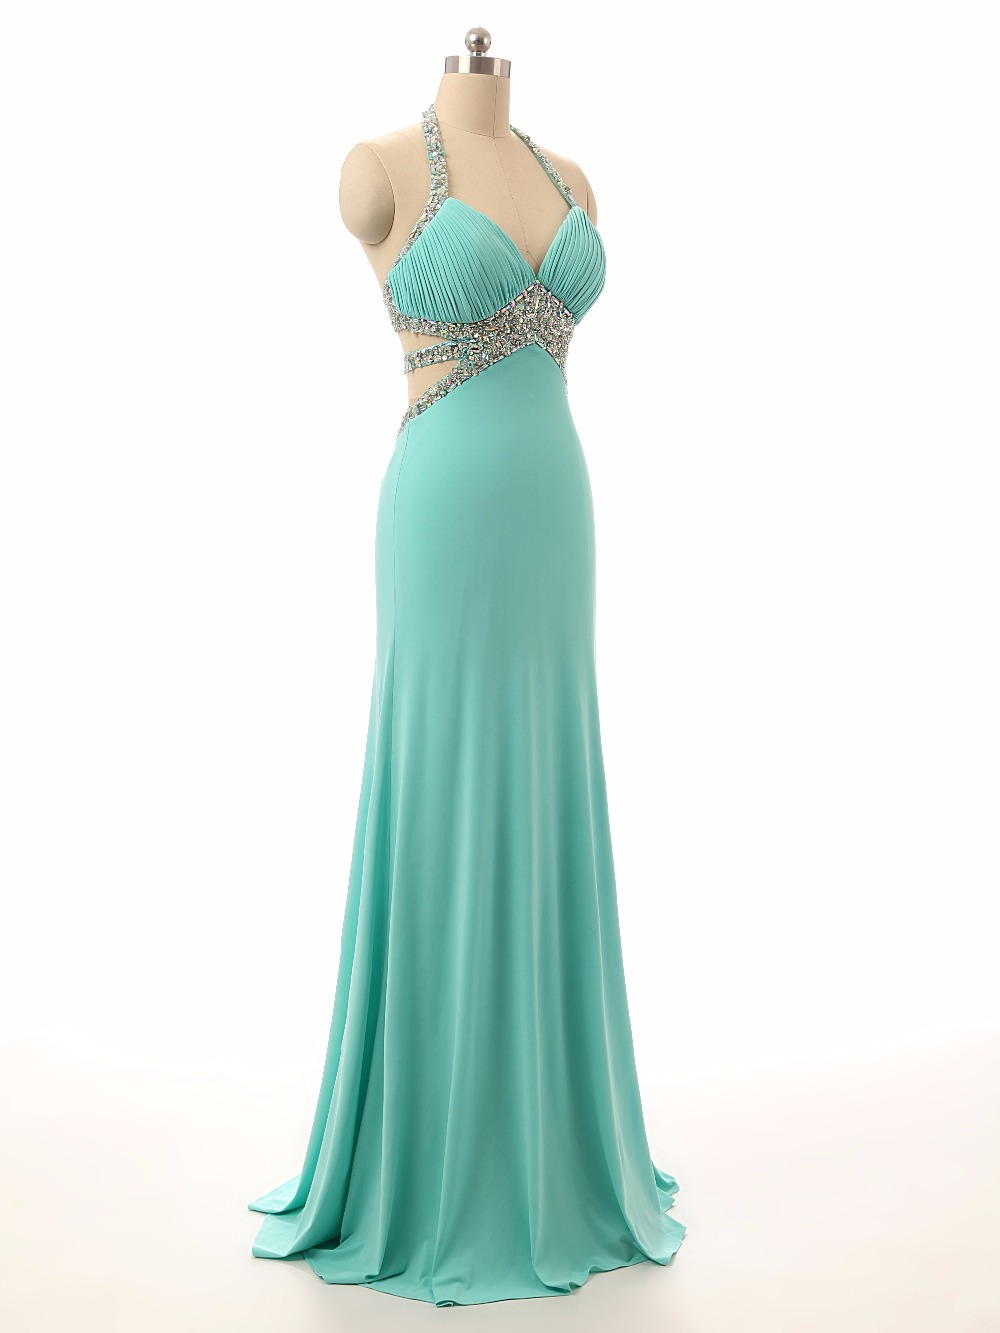 New Long Prom Dresses 2017 Halter Neck A Line Floor Length Beaded ...